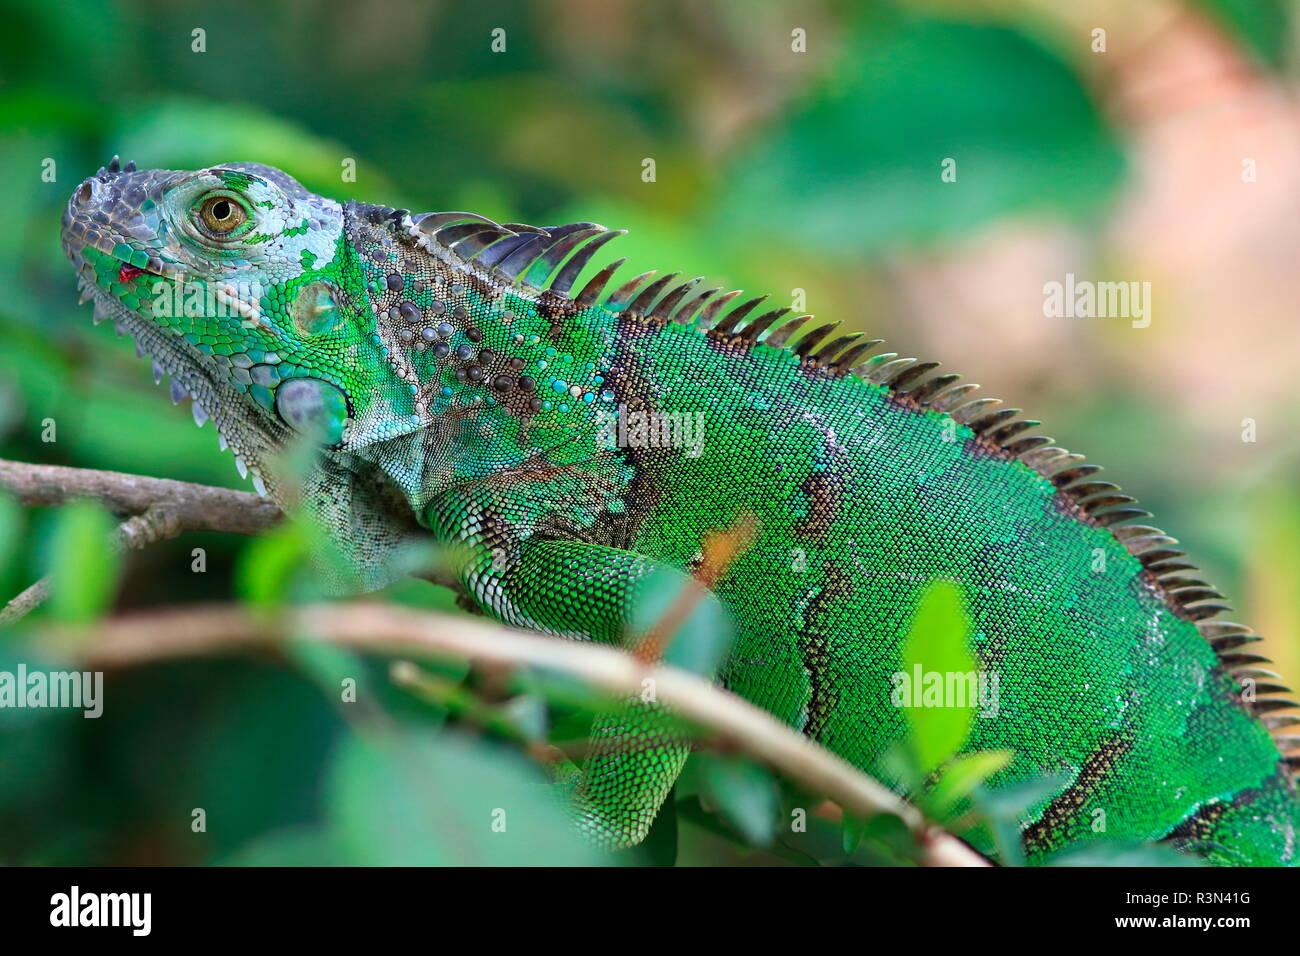 Iguane vert commun (Iguana iguana), Costa Rica Banque D'Images